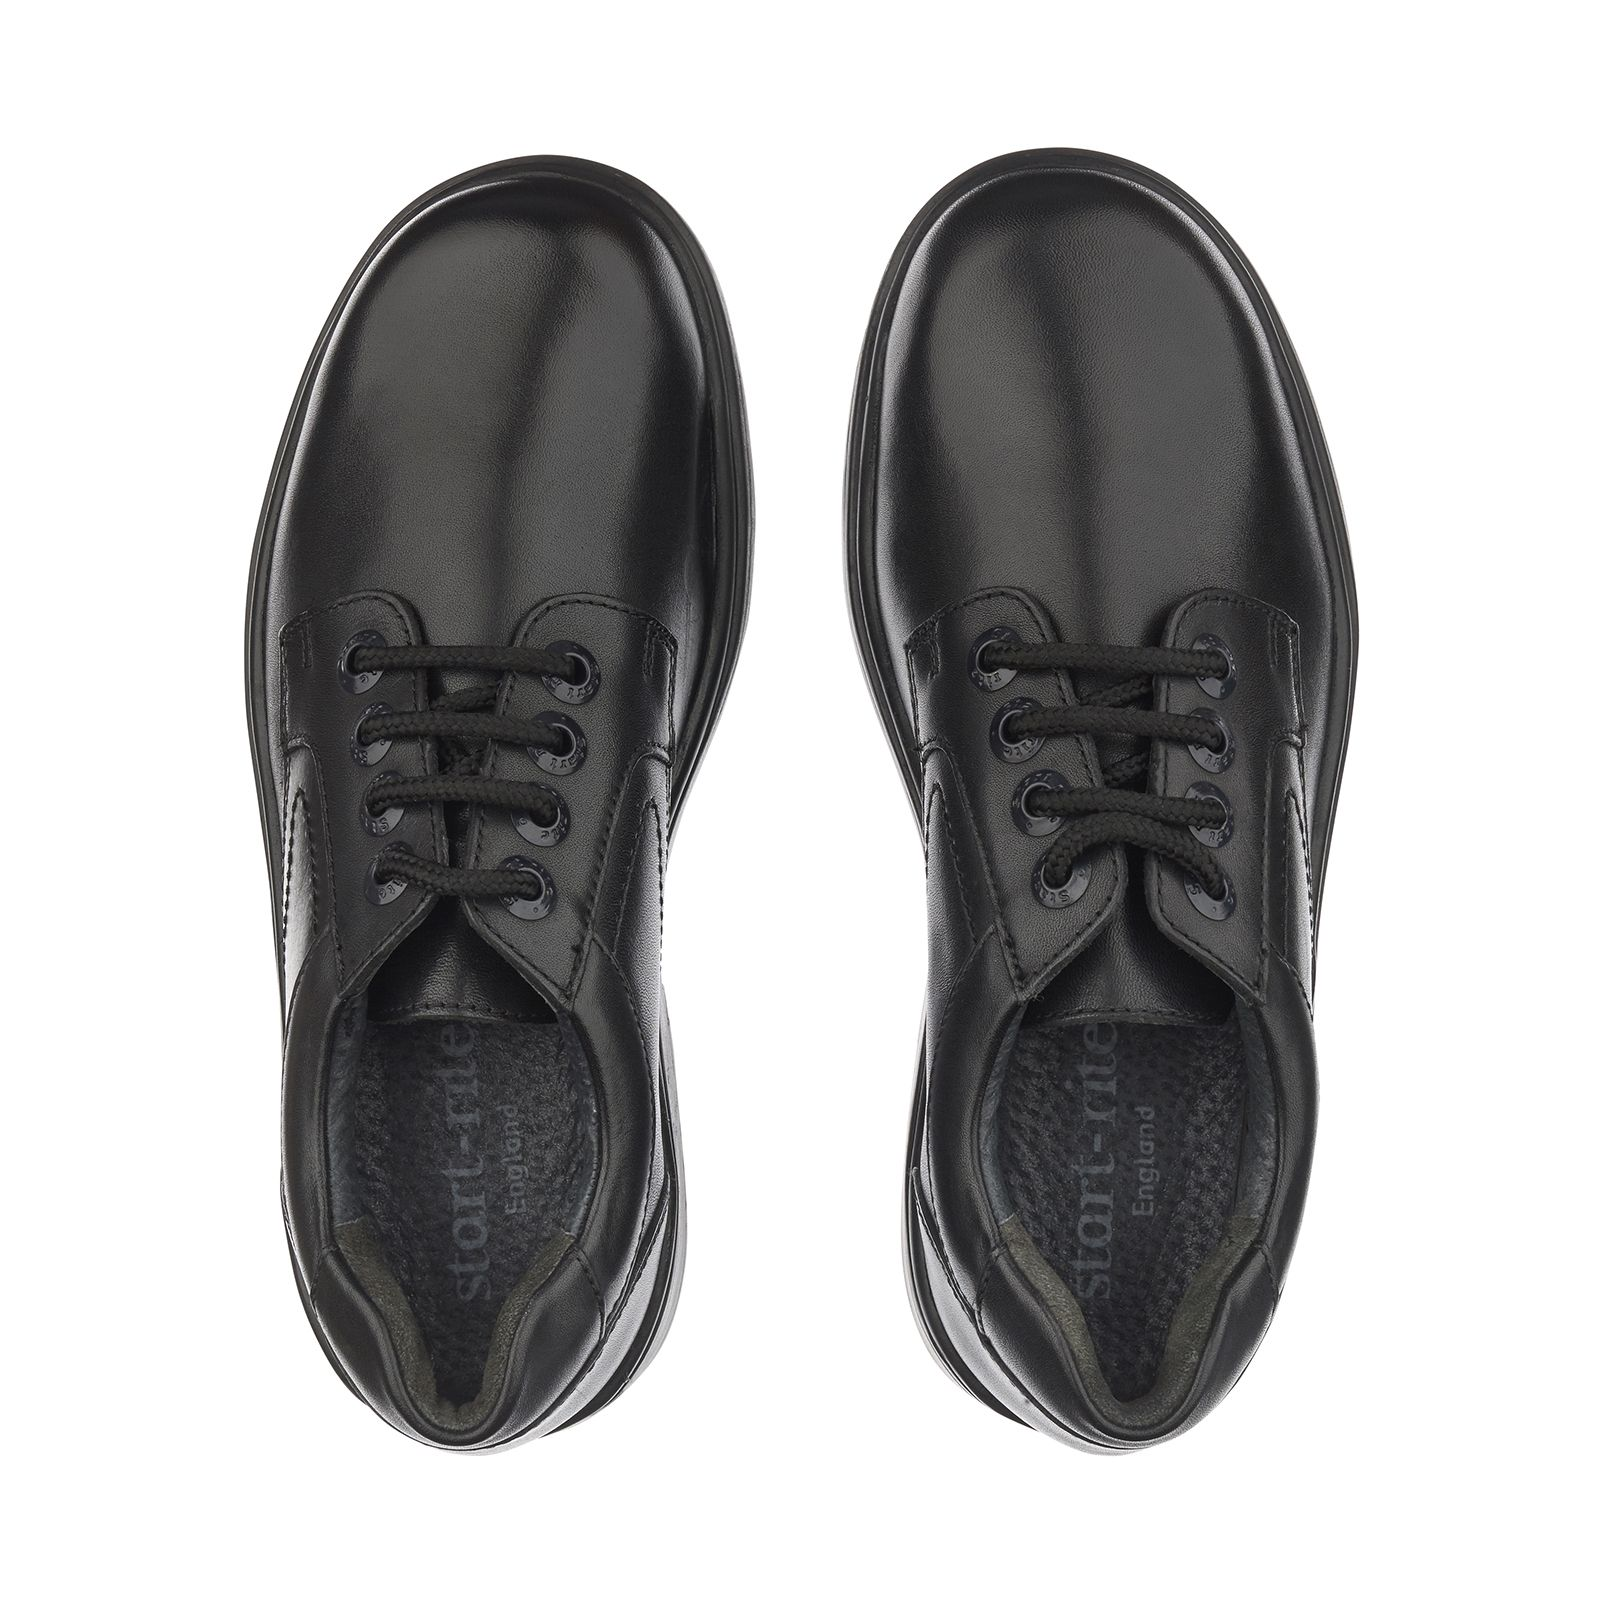 School shoes, Black leather